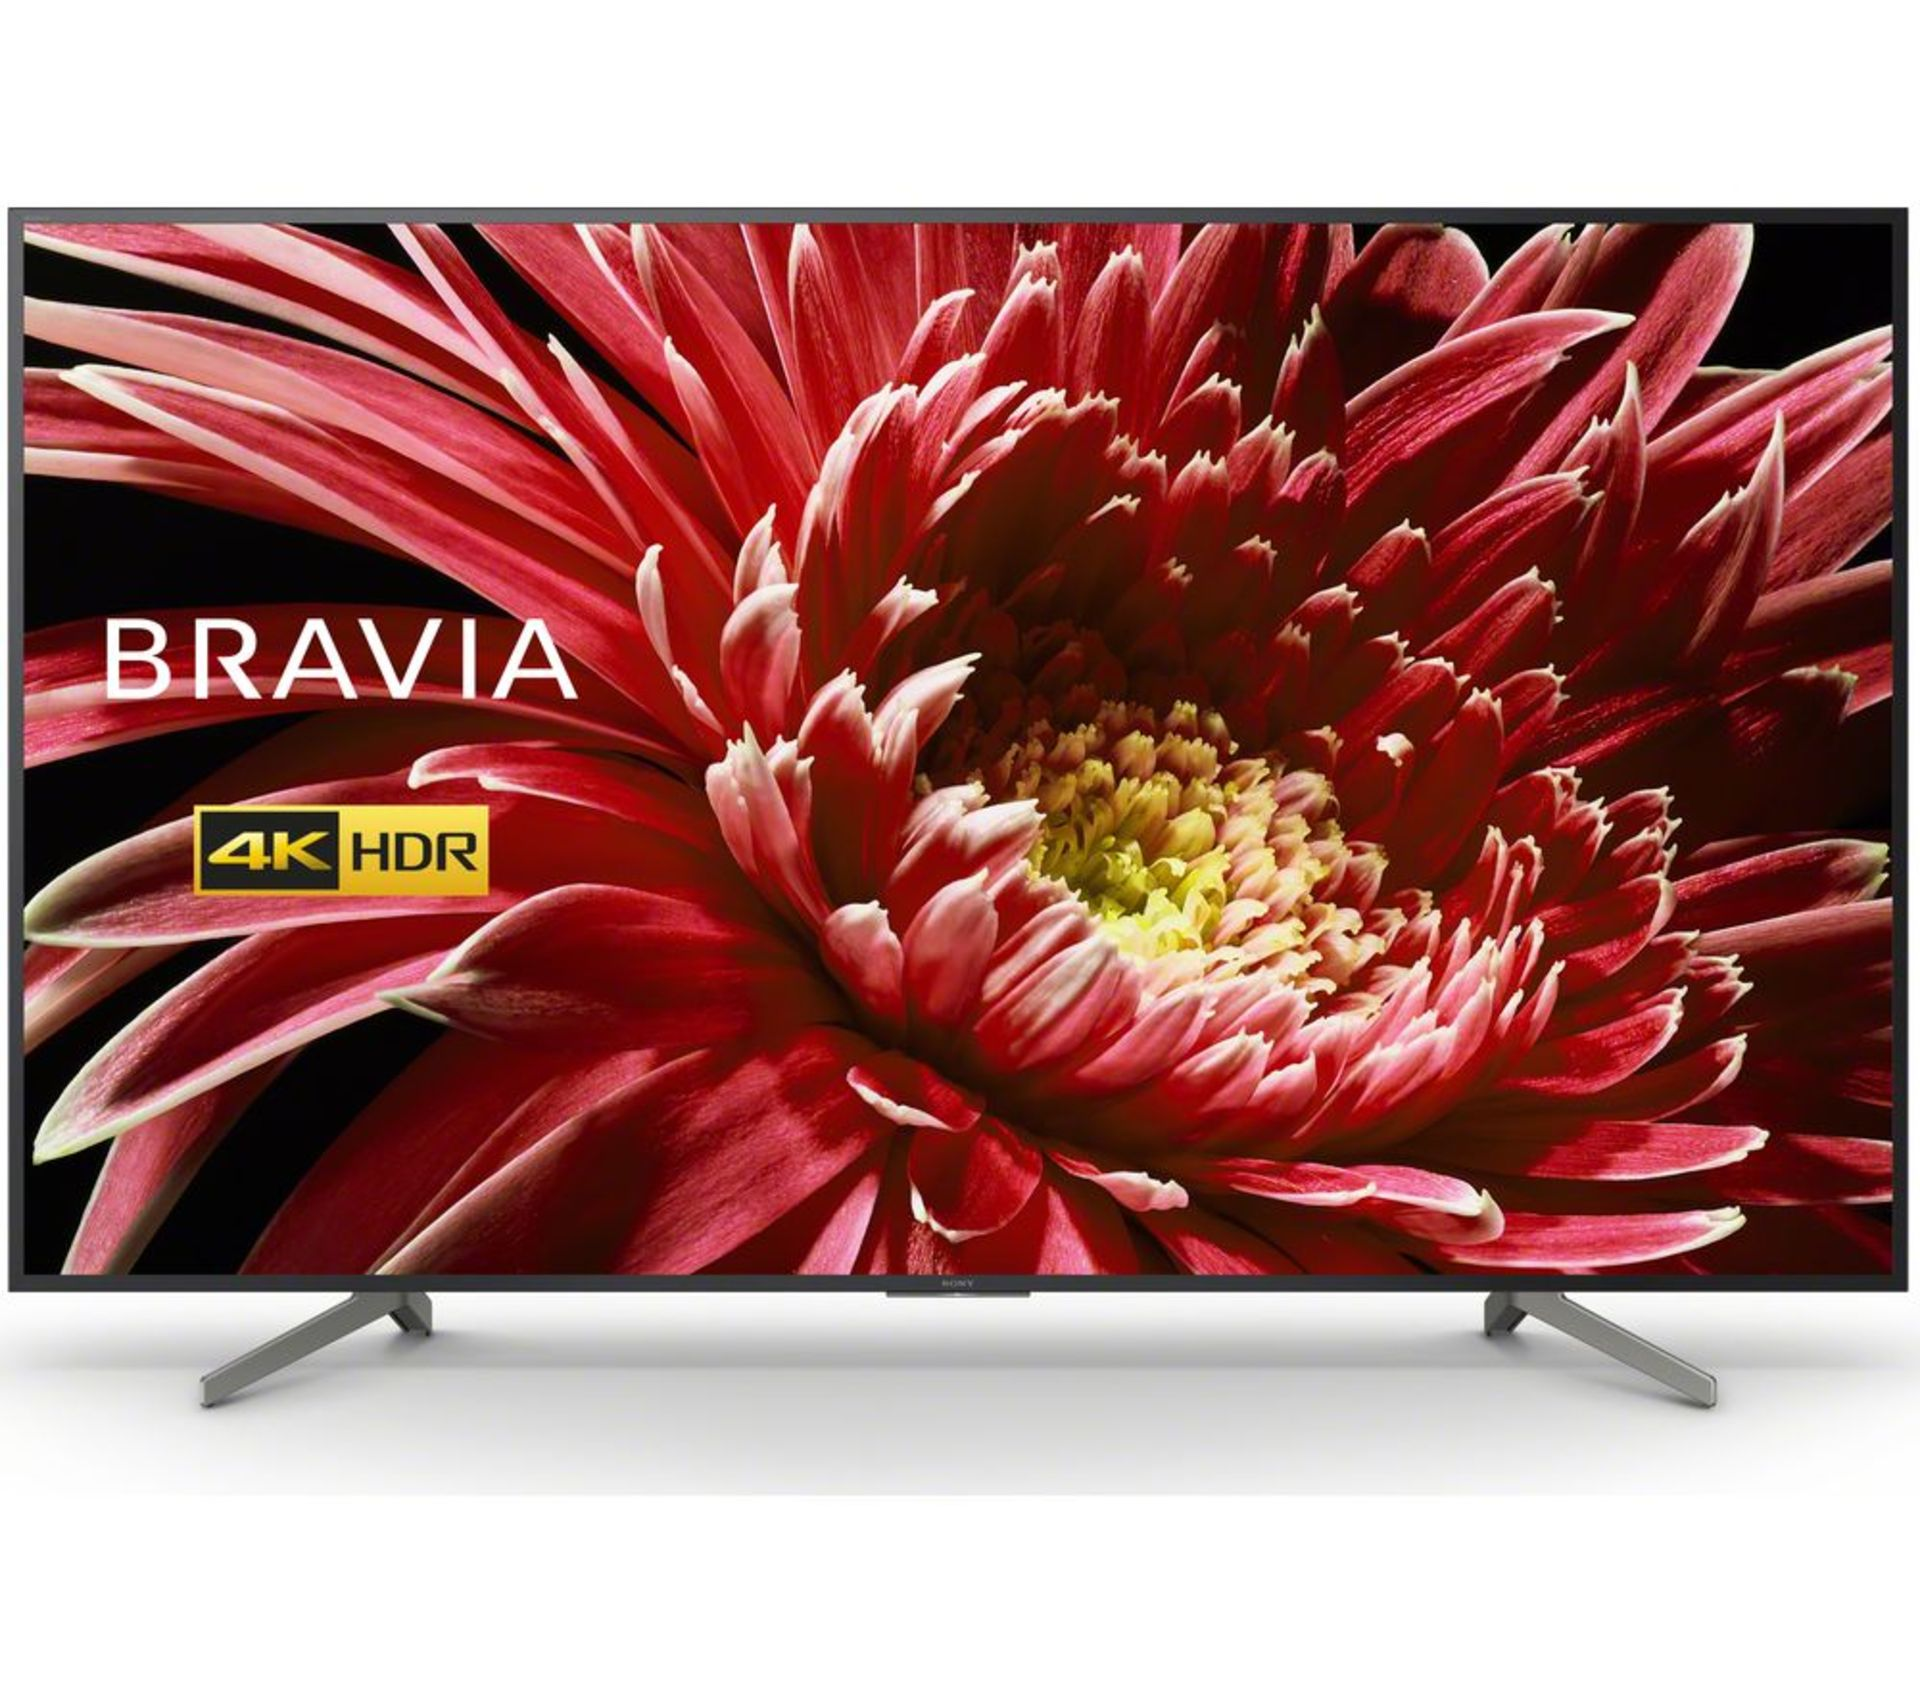 "Lot 60002 - V Brand New Sony Bravia 85"" 4K Ultra HD Smart LED TV - 4K Ultra HD 3840 x 2160p - Triluminos Display"